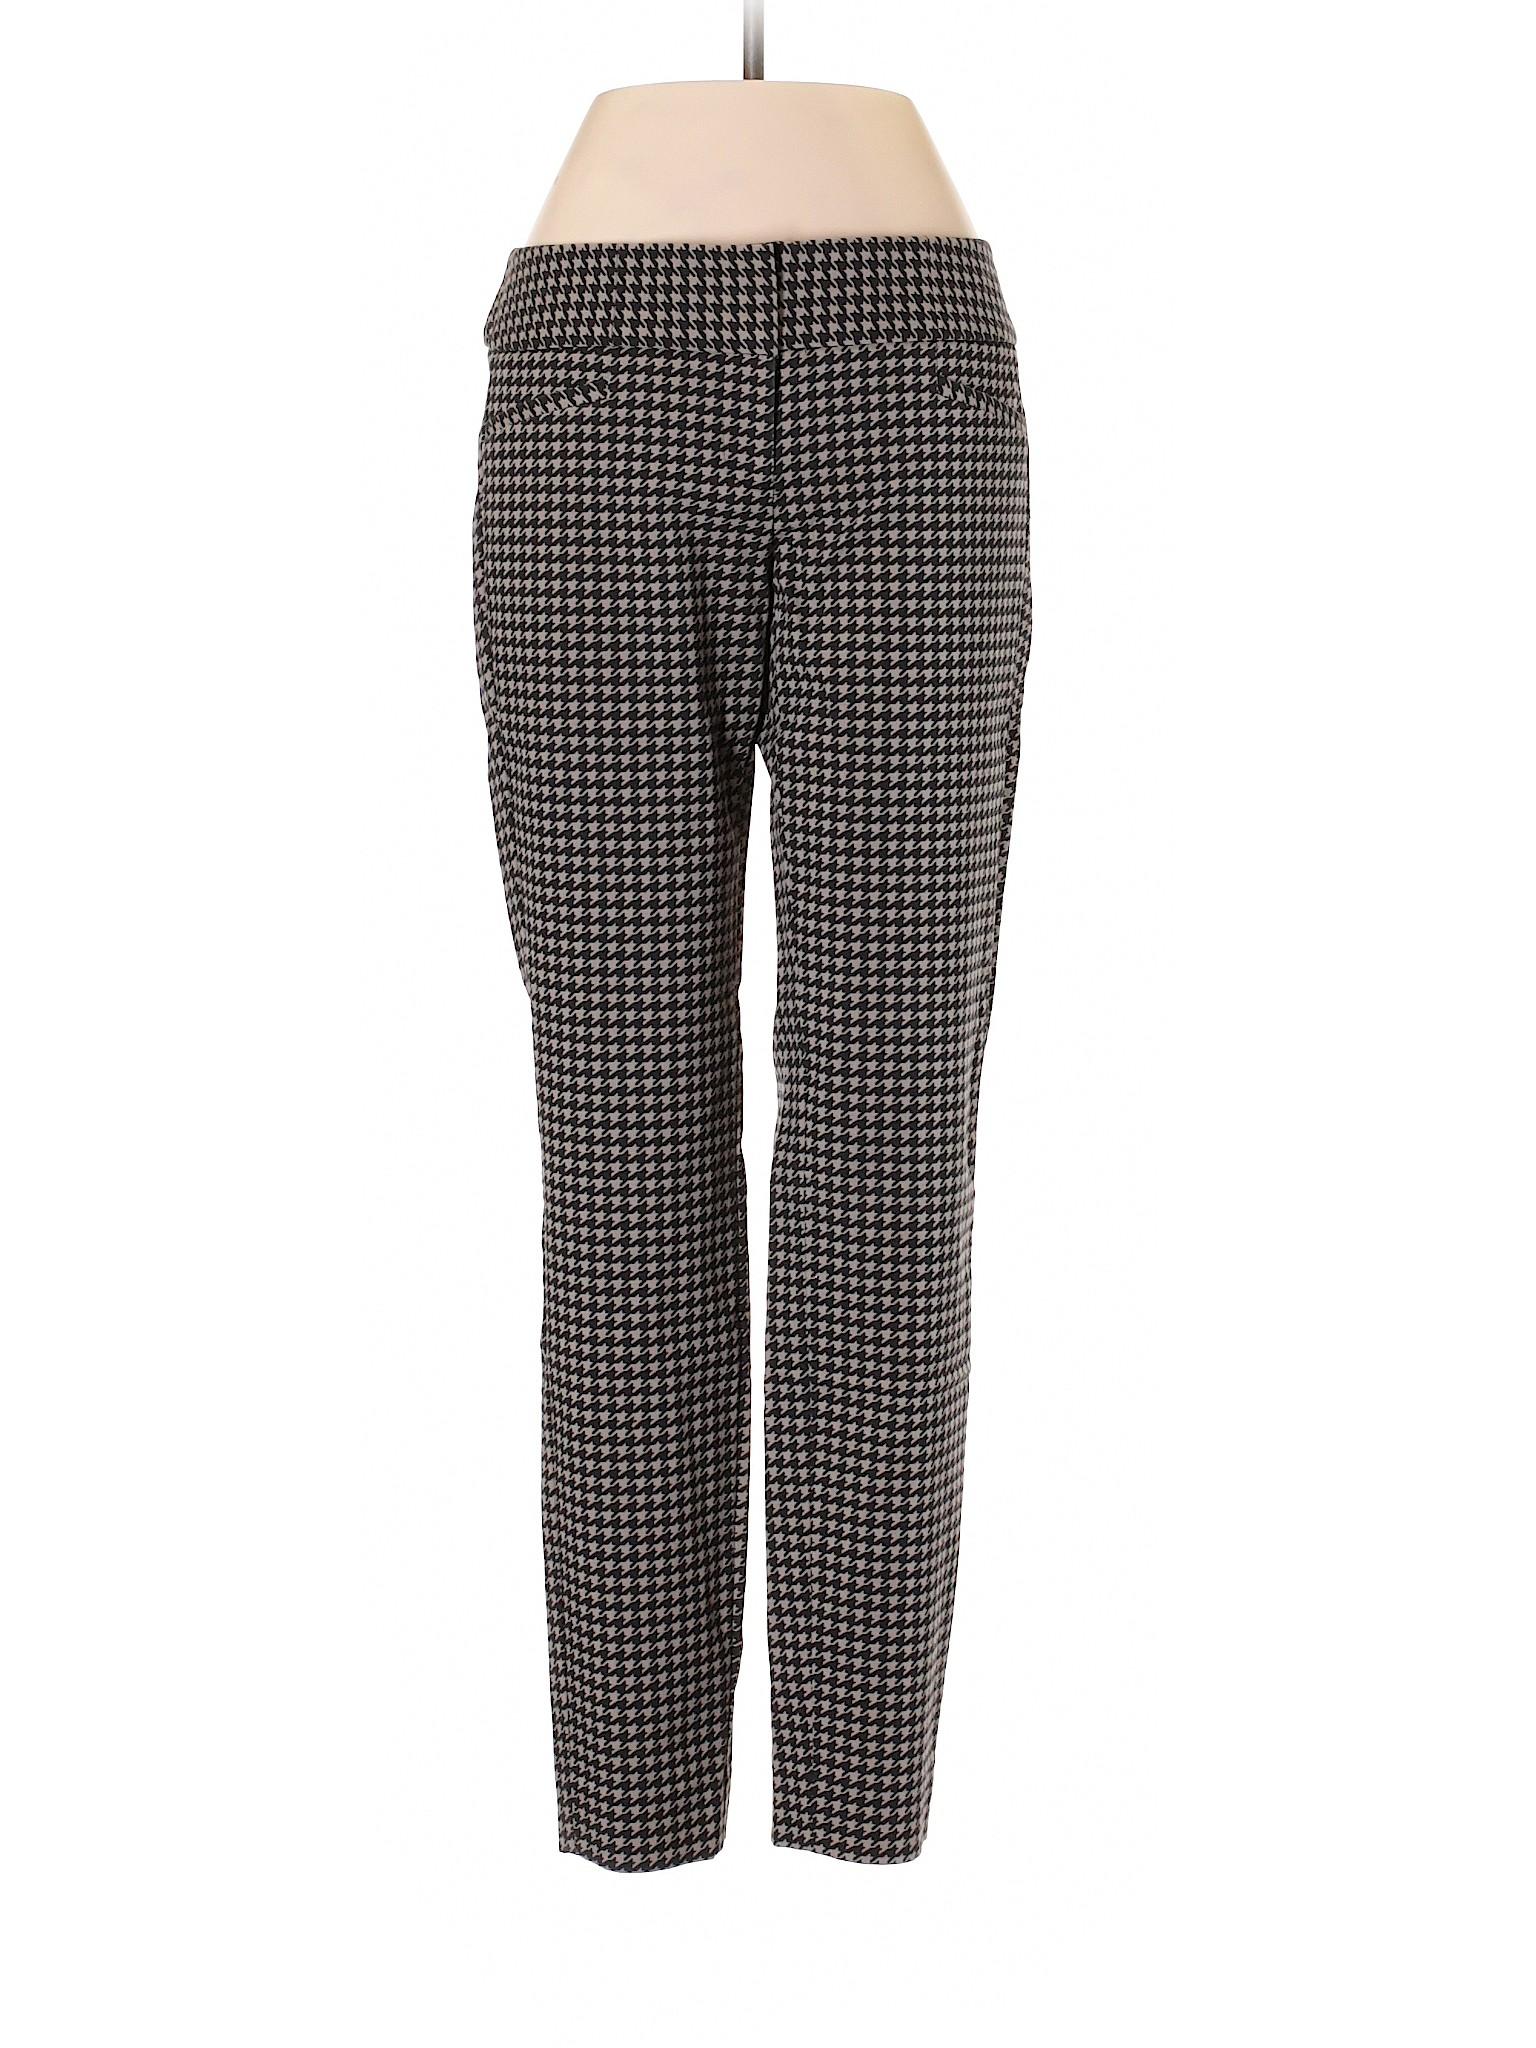 Boutique Pants Dress winter The Limited rBqrvwpxI